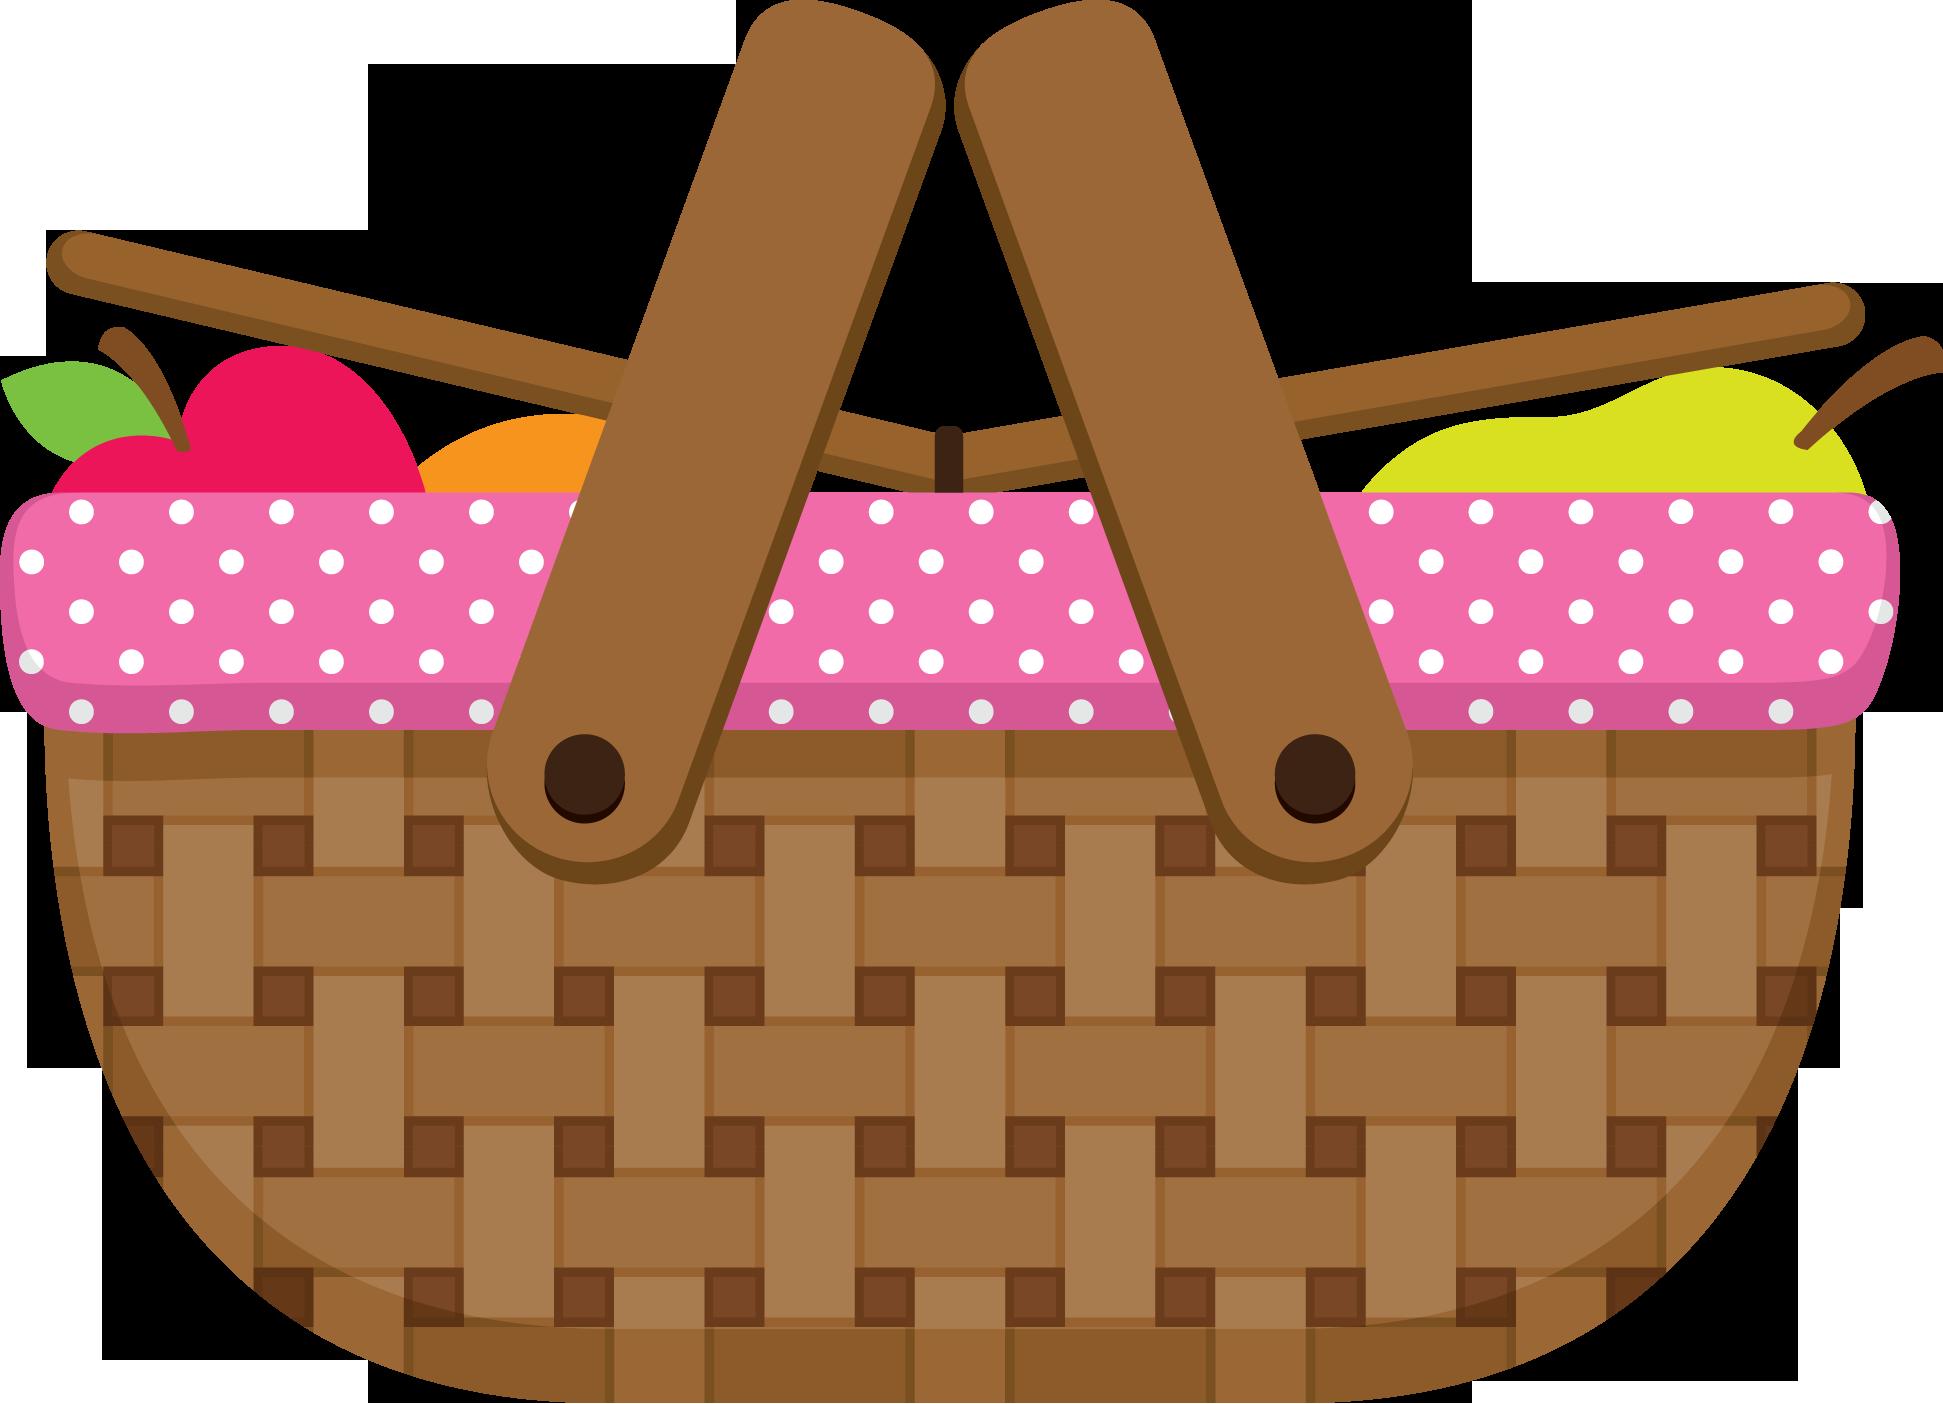 Picnic Basket clipart picnic mat Images Clipart Picnic this more